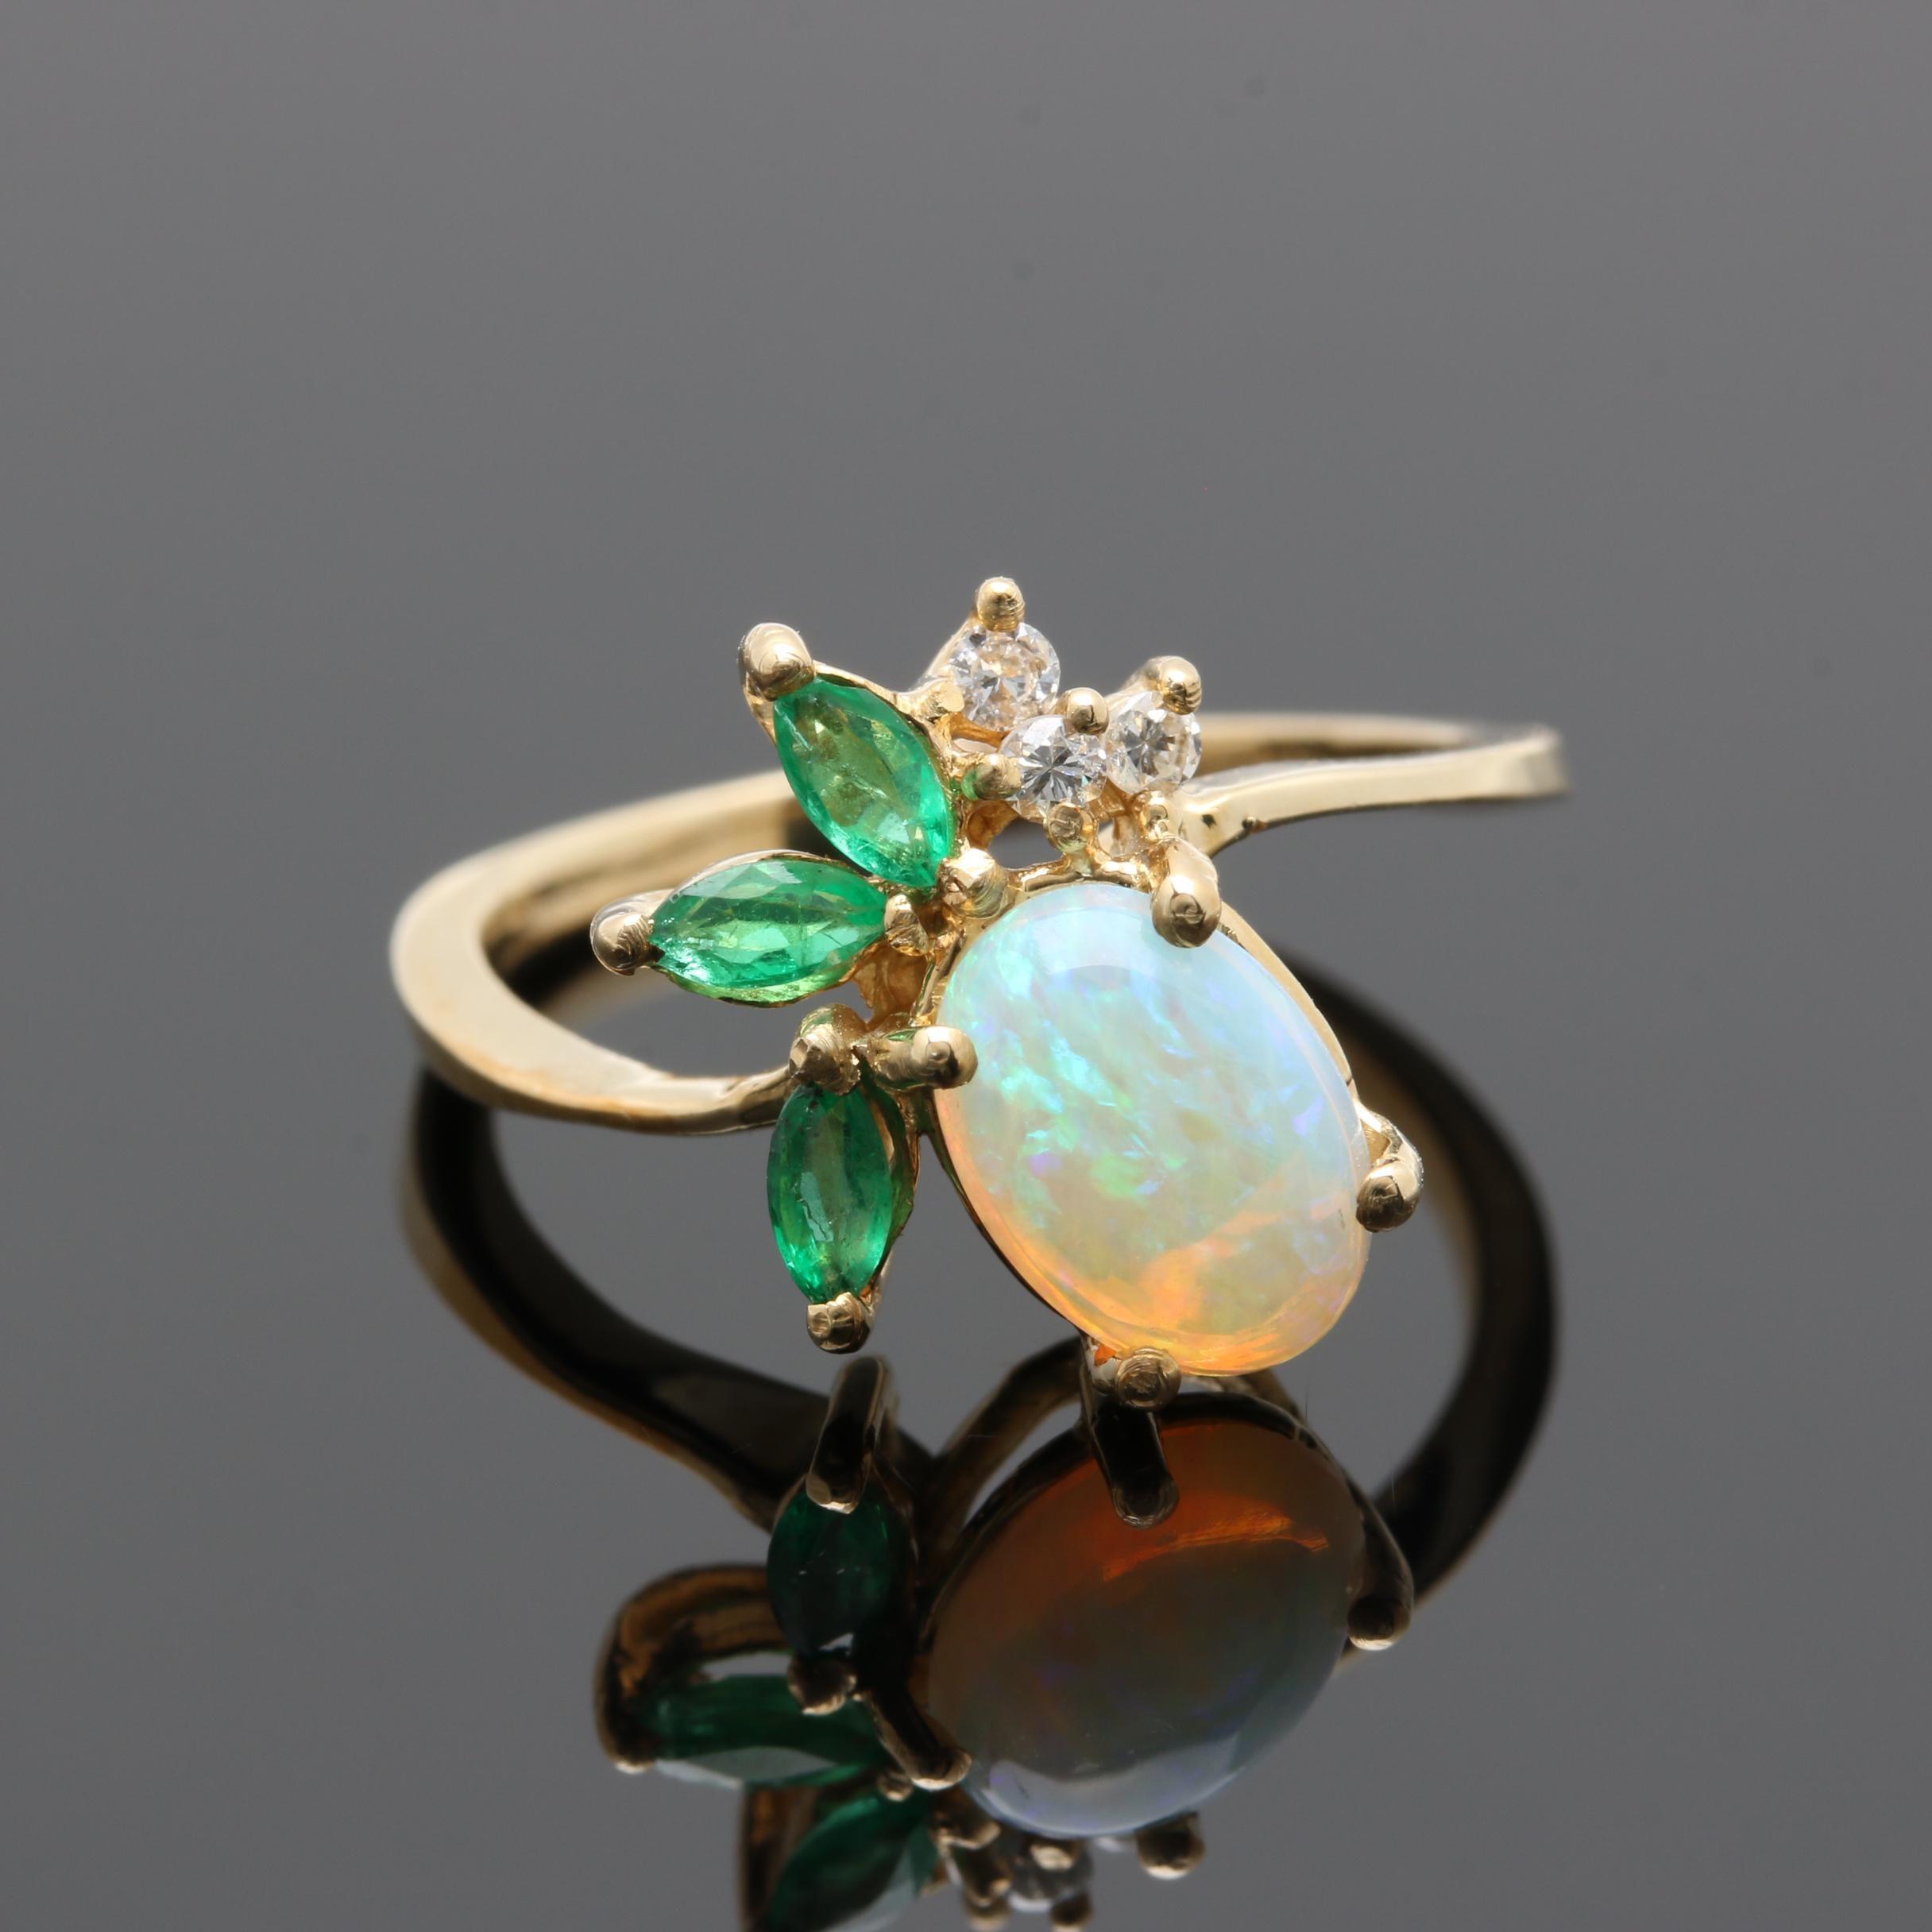 14K Yellow Gold Opal, Emerald, and Diamond Ring